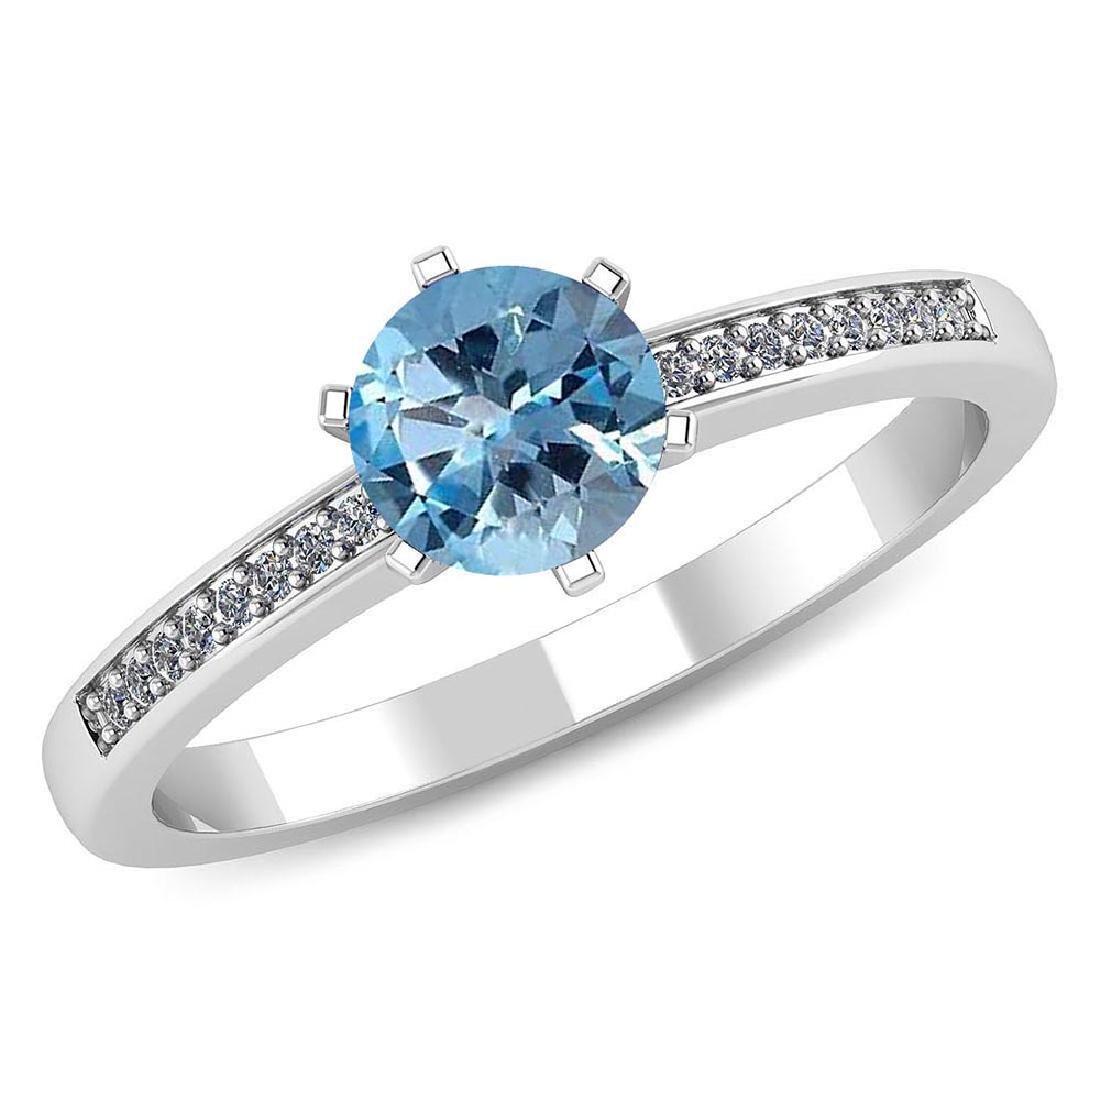 Certified 1.00 CTW Genuine Aquamarine And Diamond 14K W